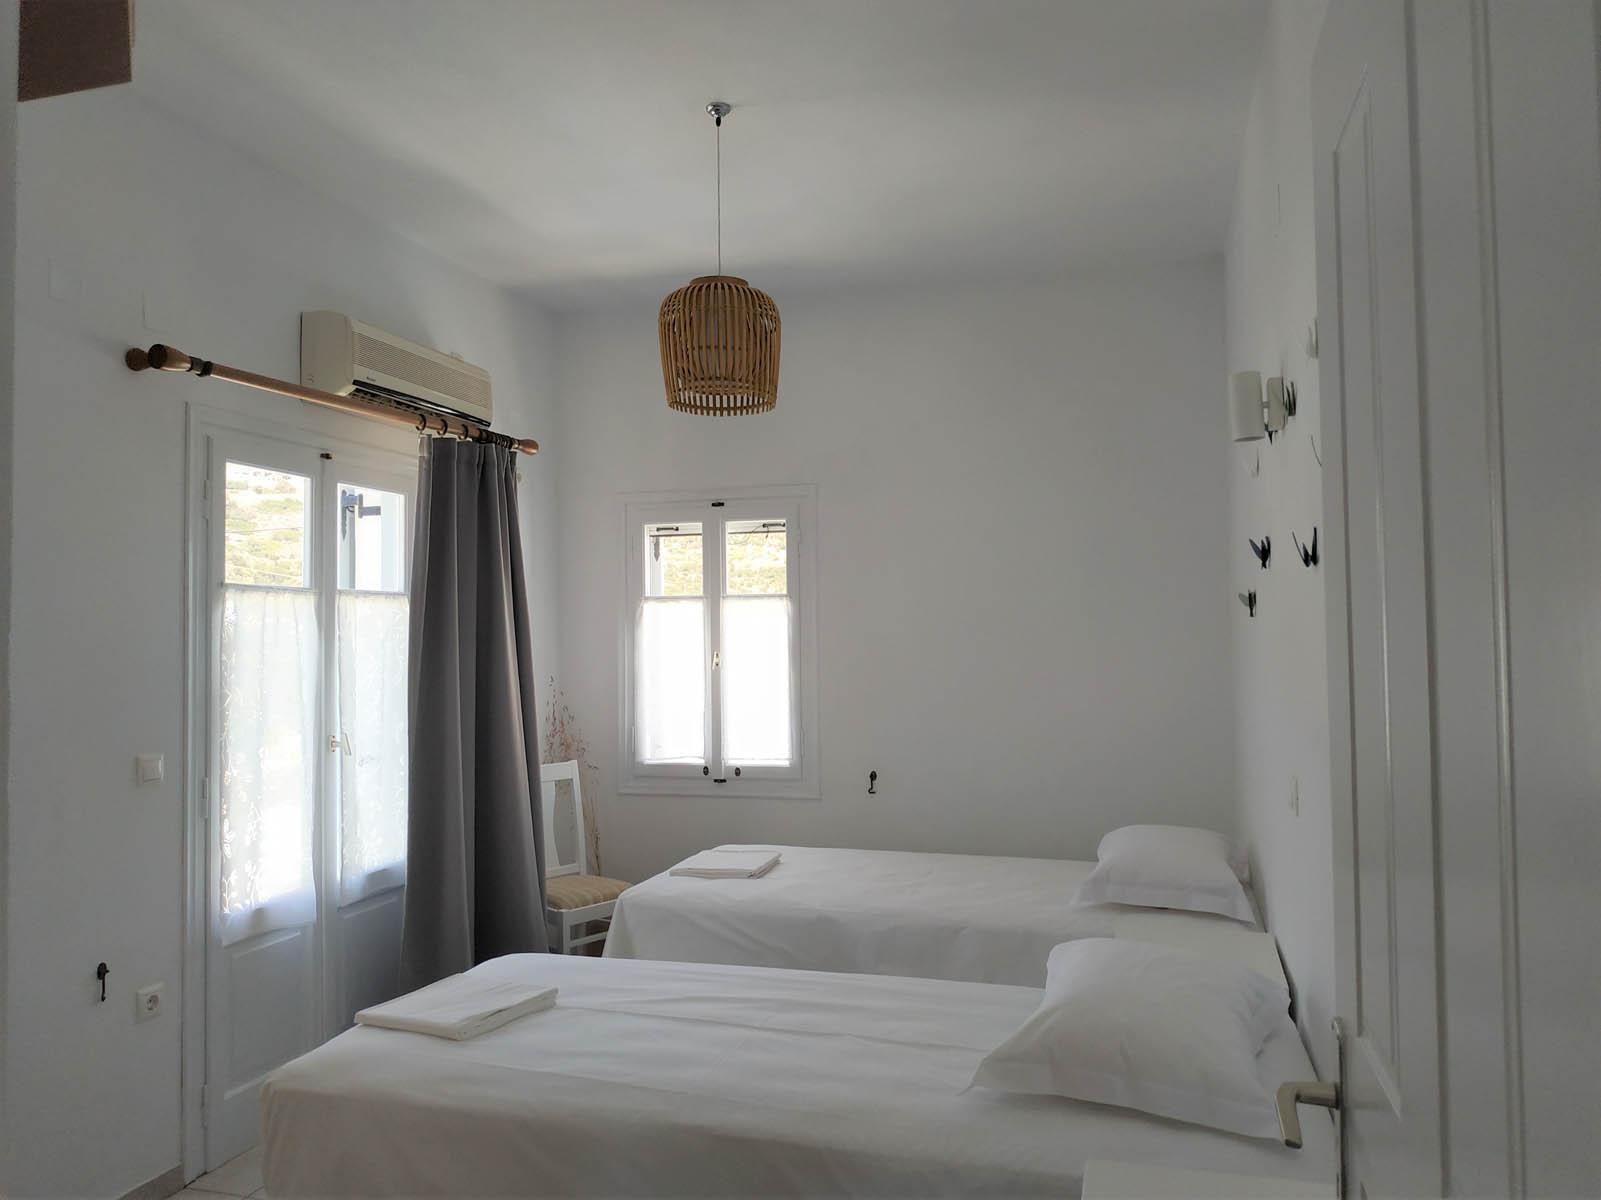 2bedroom apartment (16)